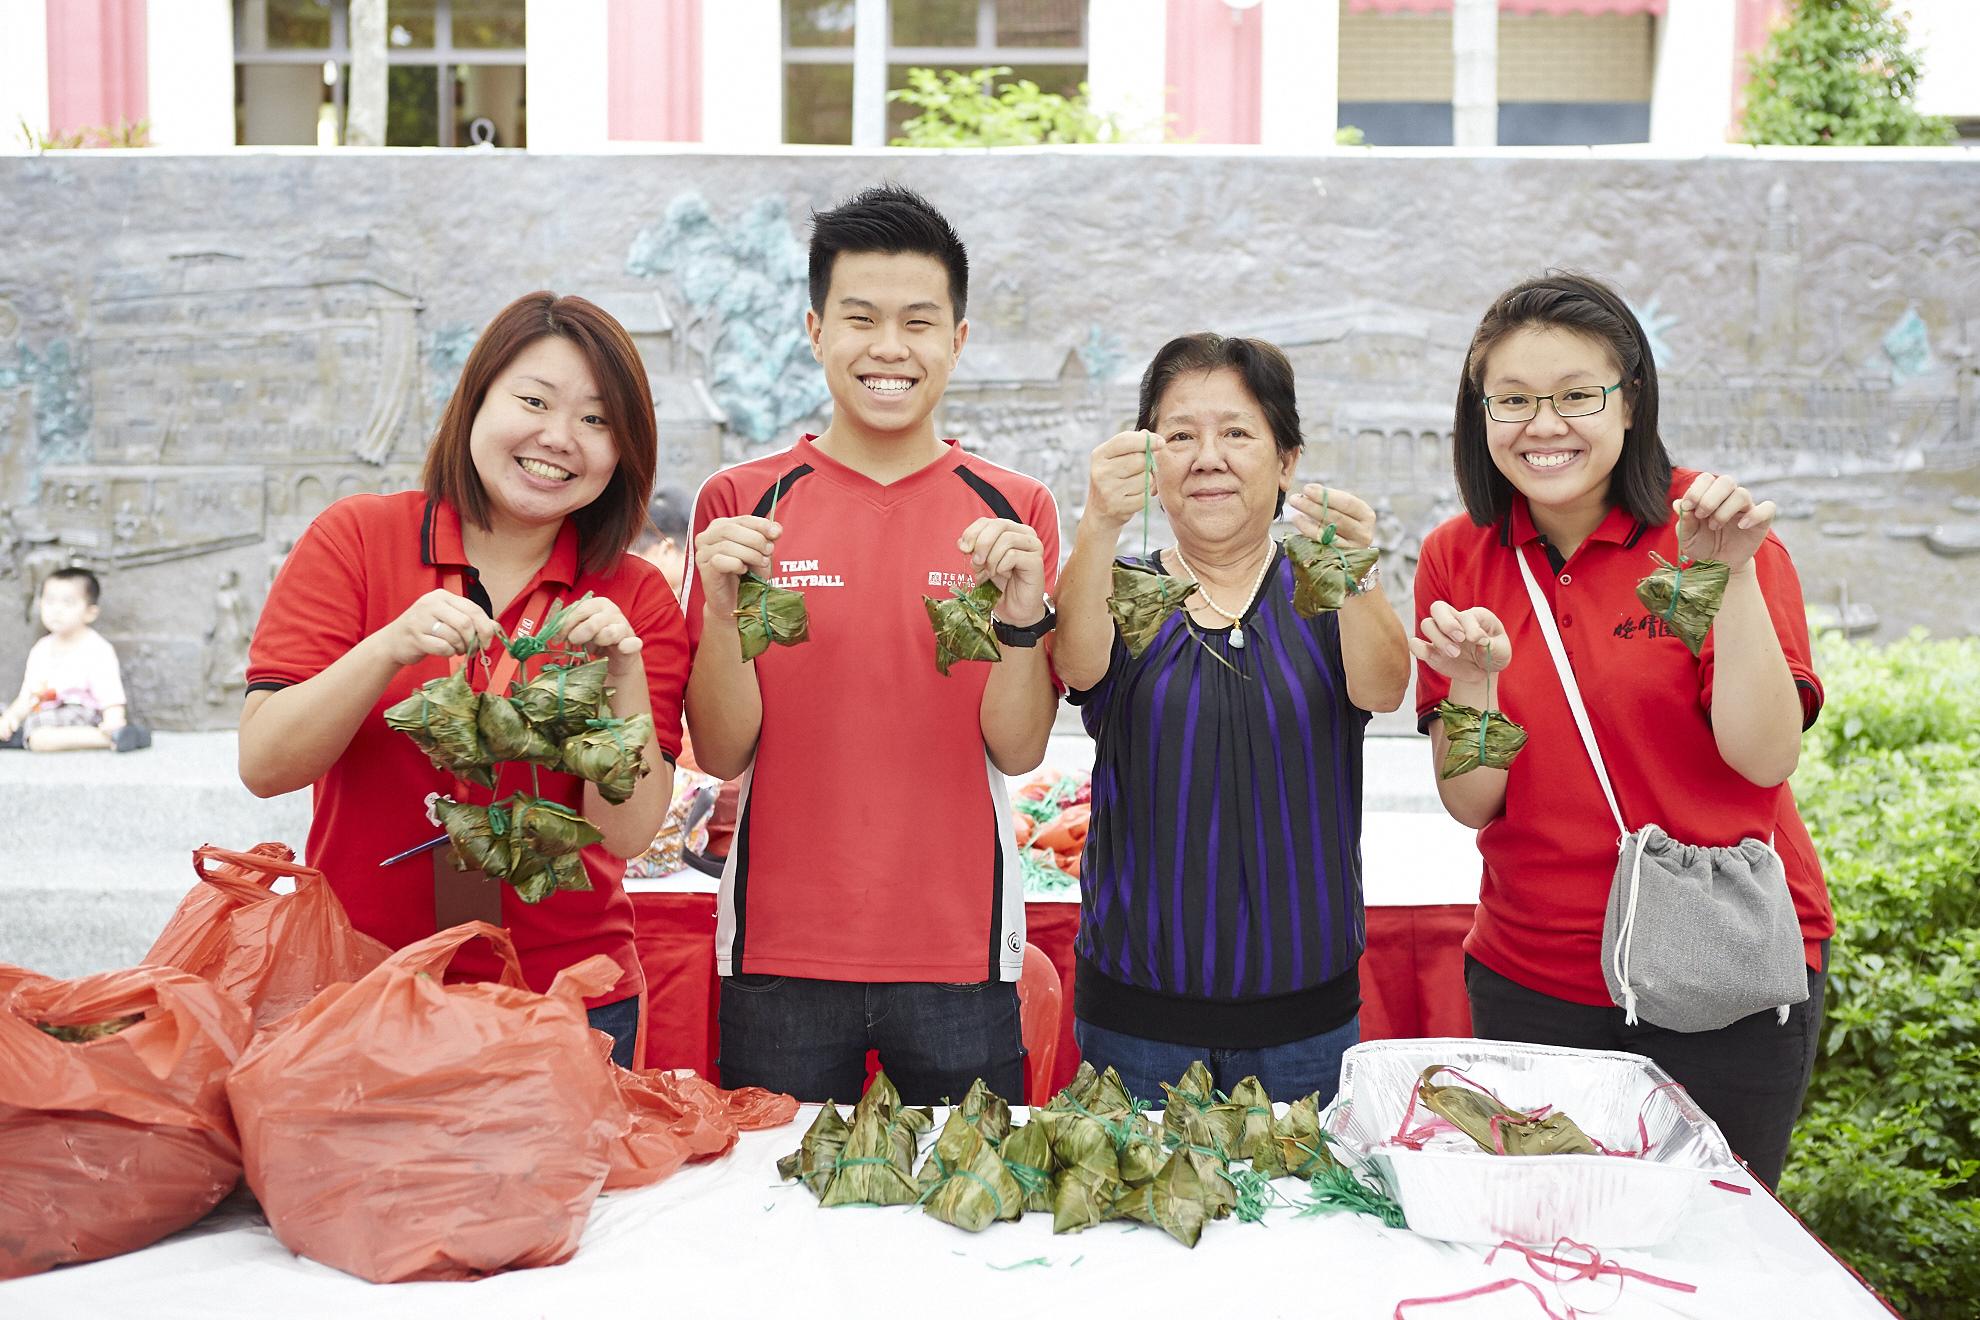 wan qing dumpling festival snack booth